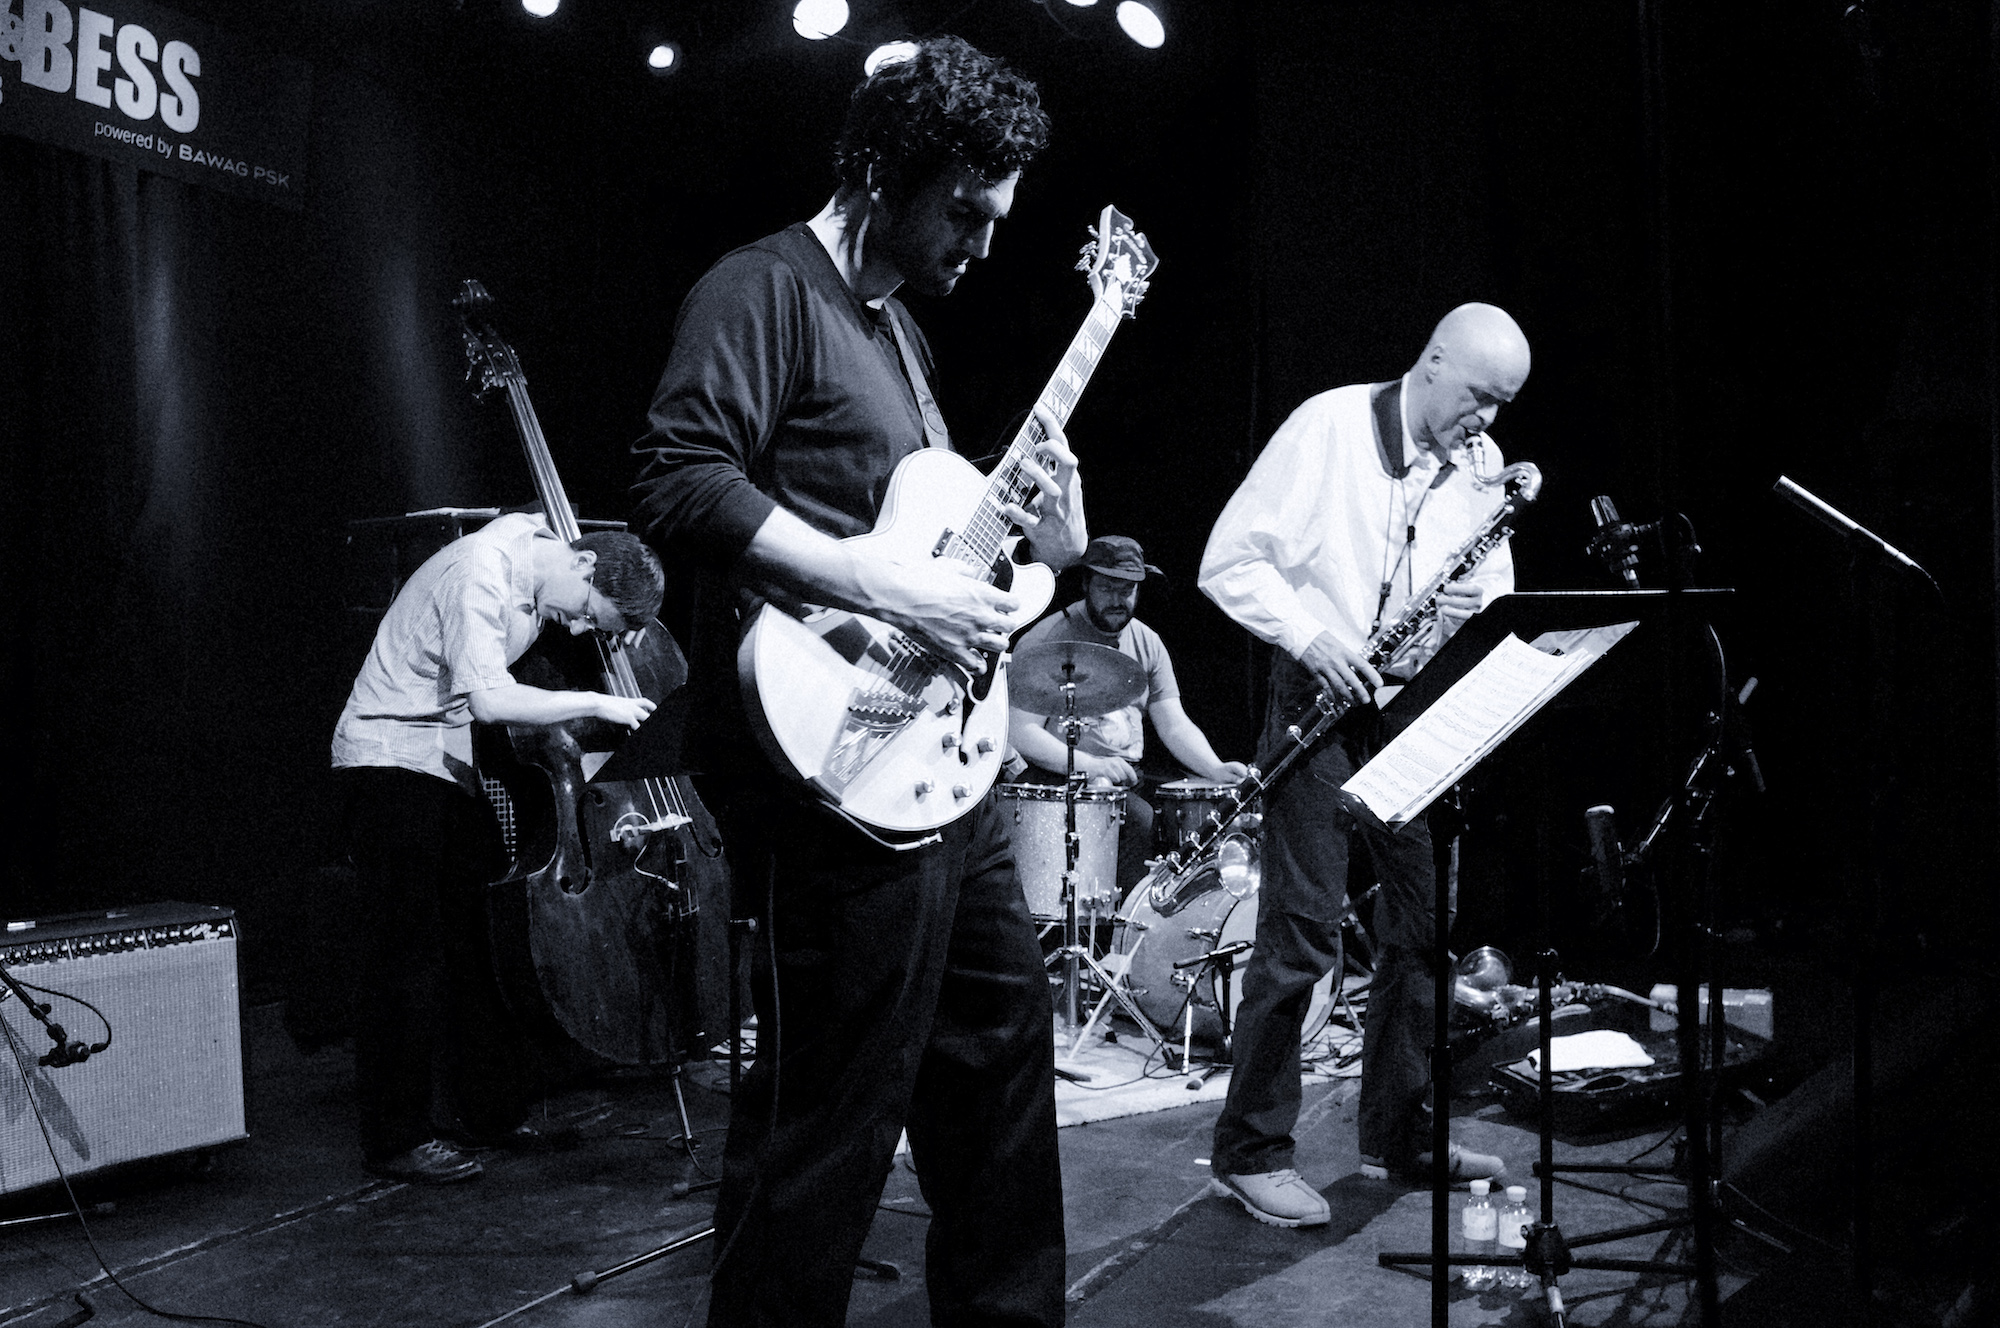 Scott DuBois Quartet live in Vienna, Austria